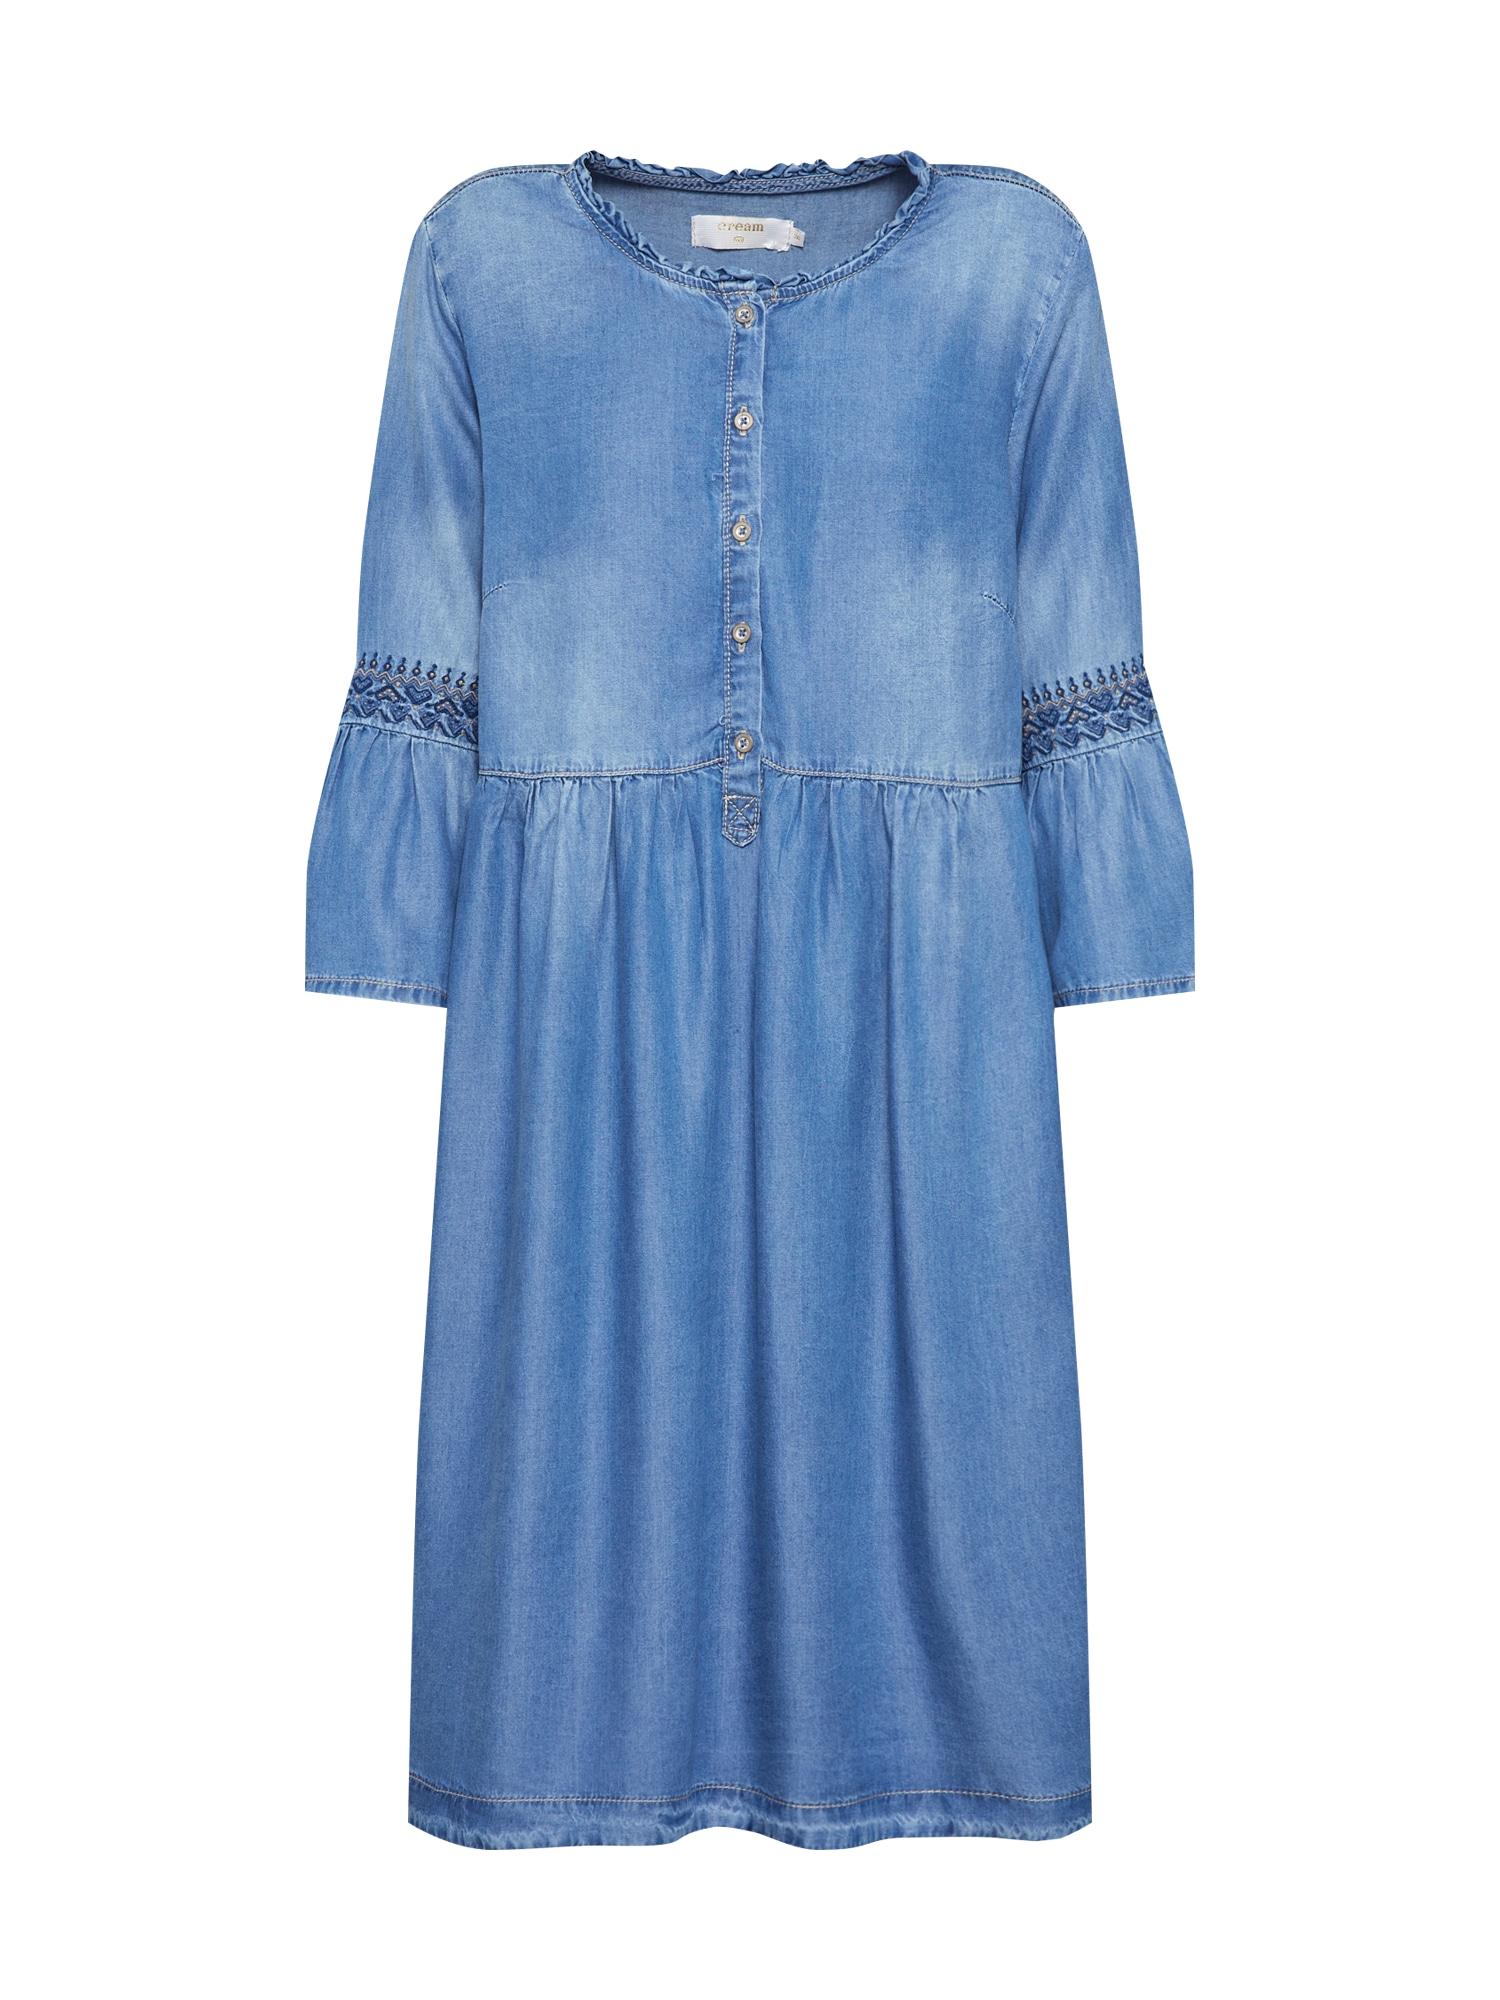 Košilové šaty Lussa modrá džínovina Cream